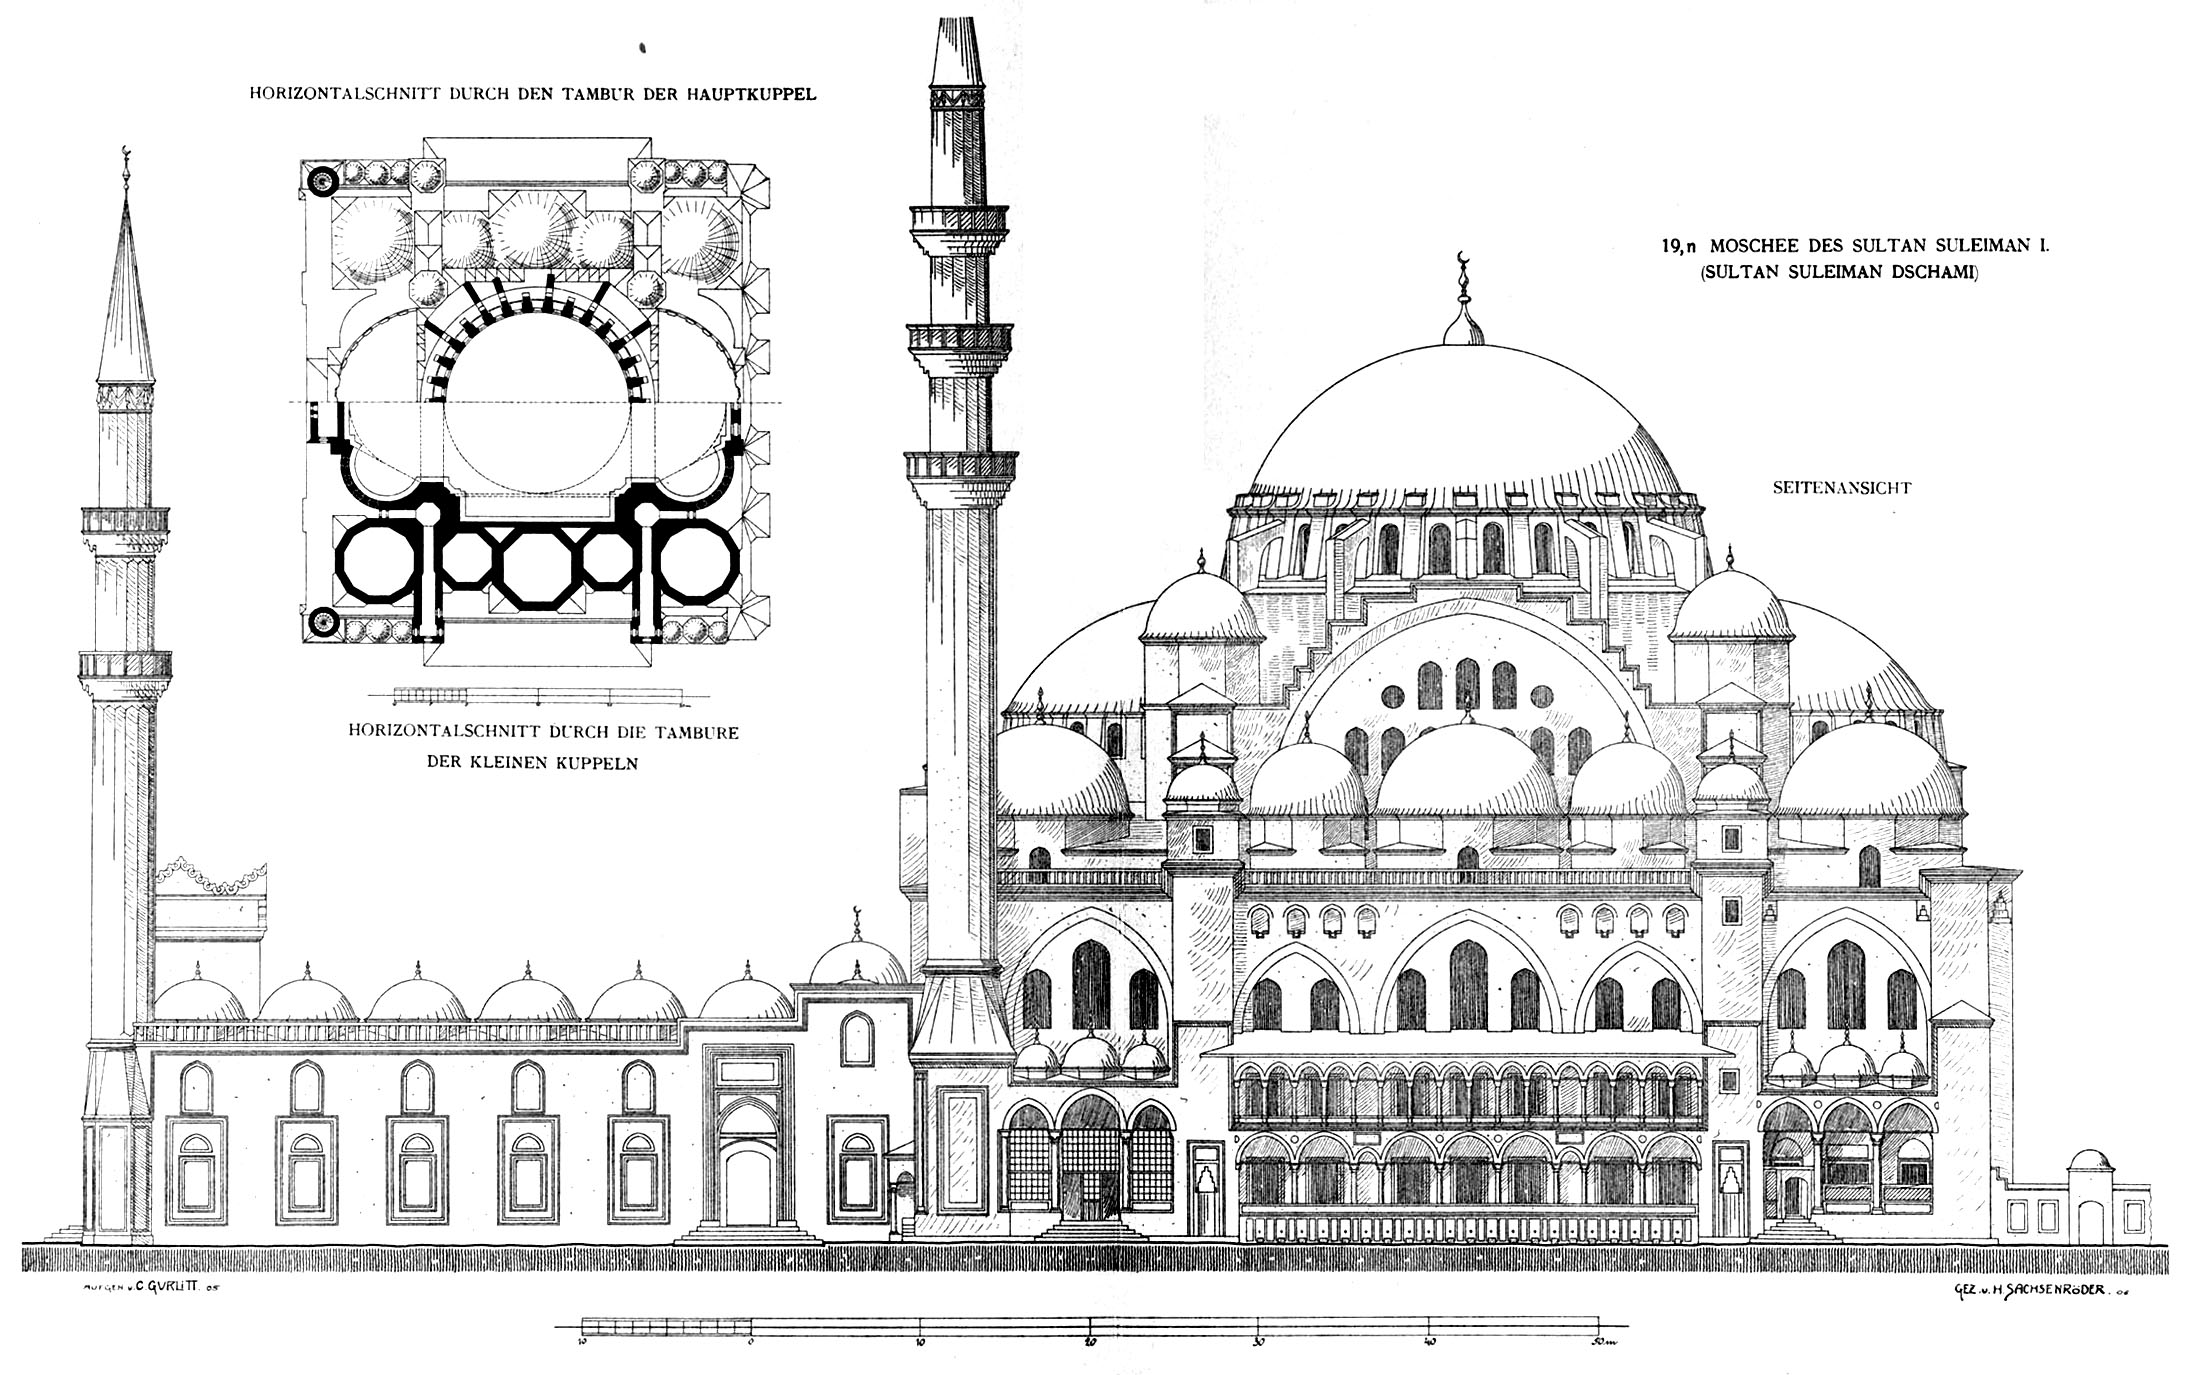 https://i2.wp.com/upload.wikimedia.org/wikipedia/commons/1/13/Suleymaniye_Mosque_cleaned_Gurlitt_1912.jpg